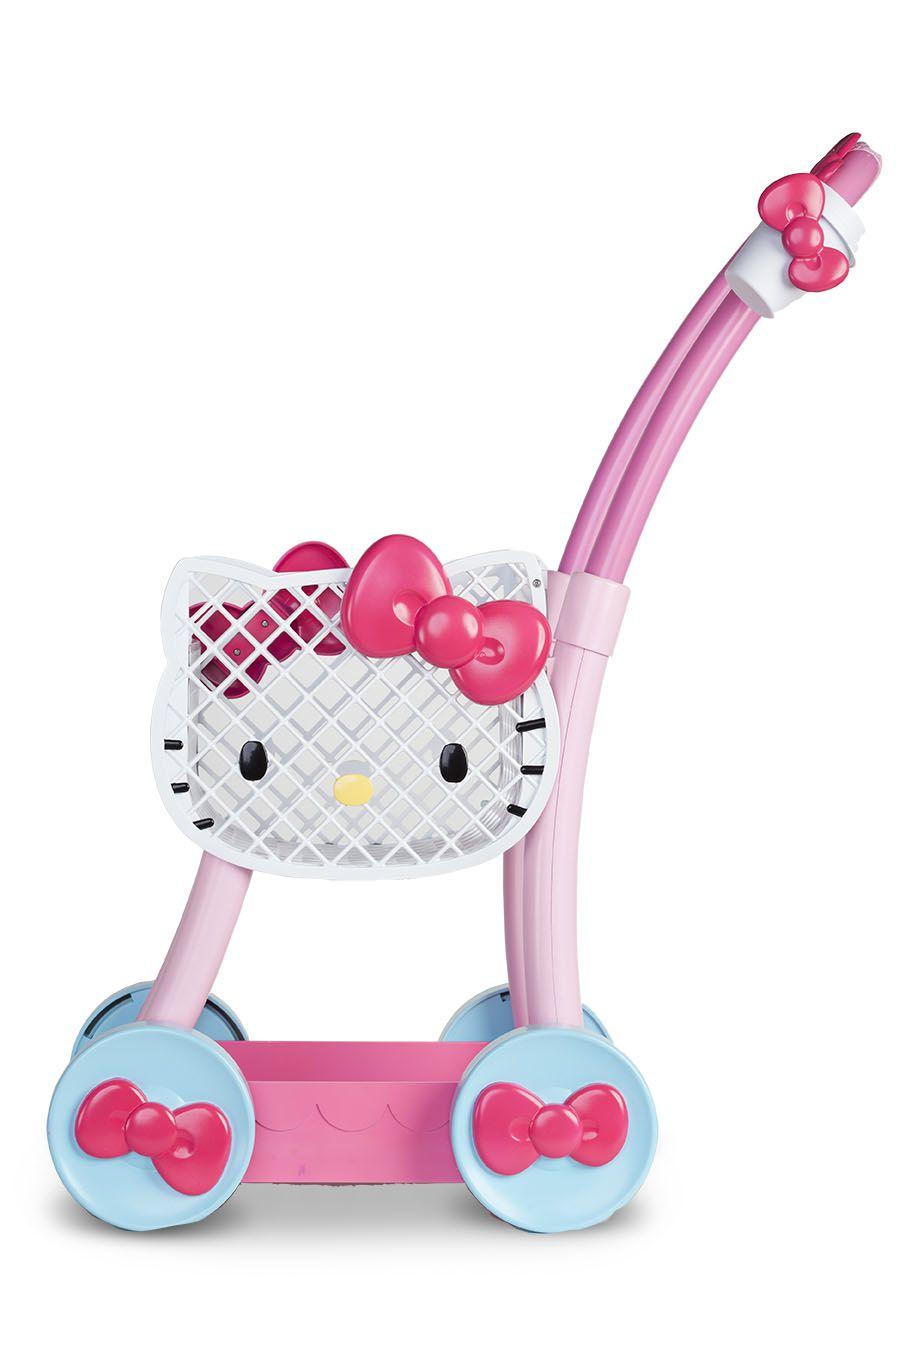 Toys For Hello Kitty : Hello kitty toys for girls